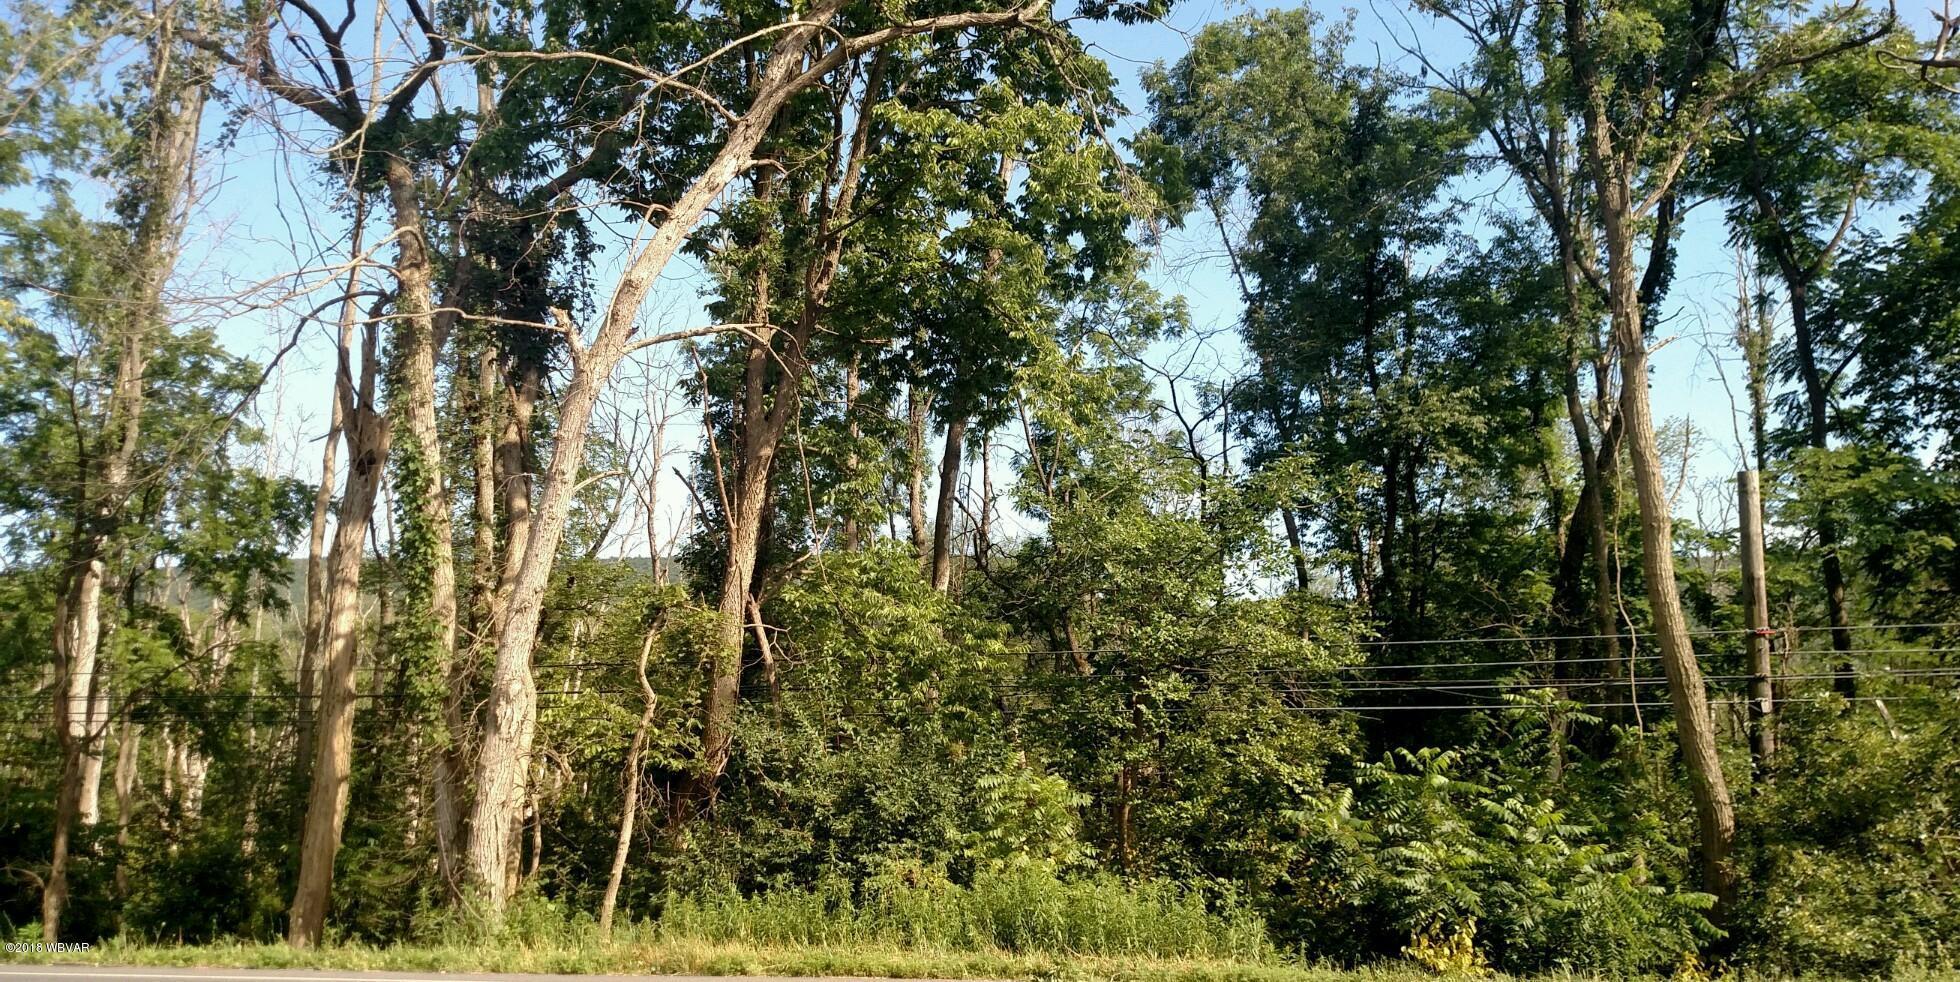 EAGLE VALLEY ROAD,Beech Creek,PA 16822,Land,EAGLE VALLEY,WB-86901